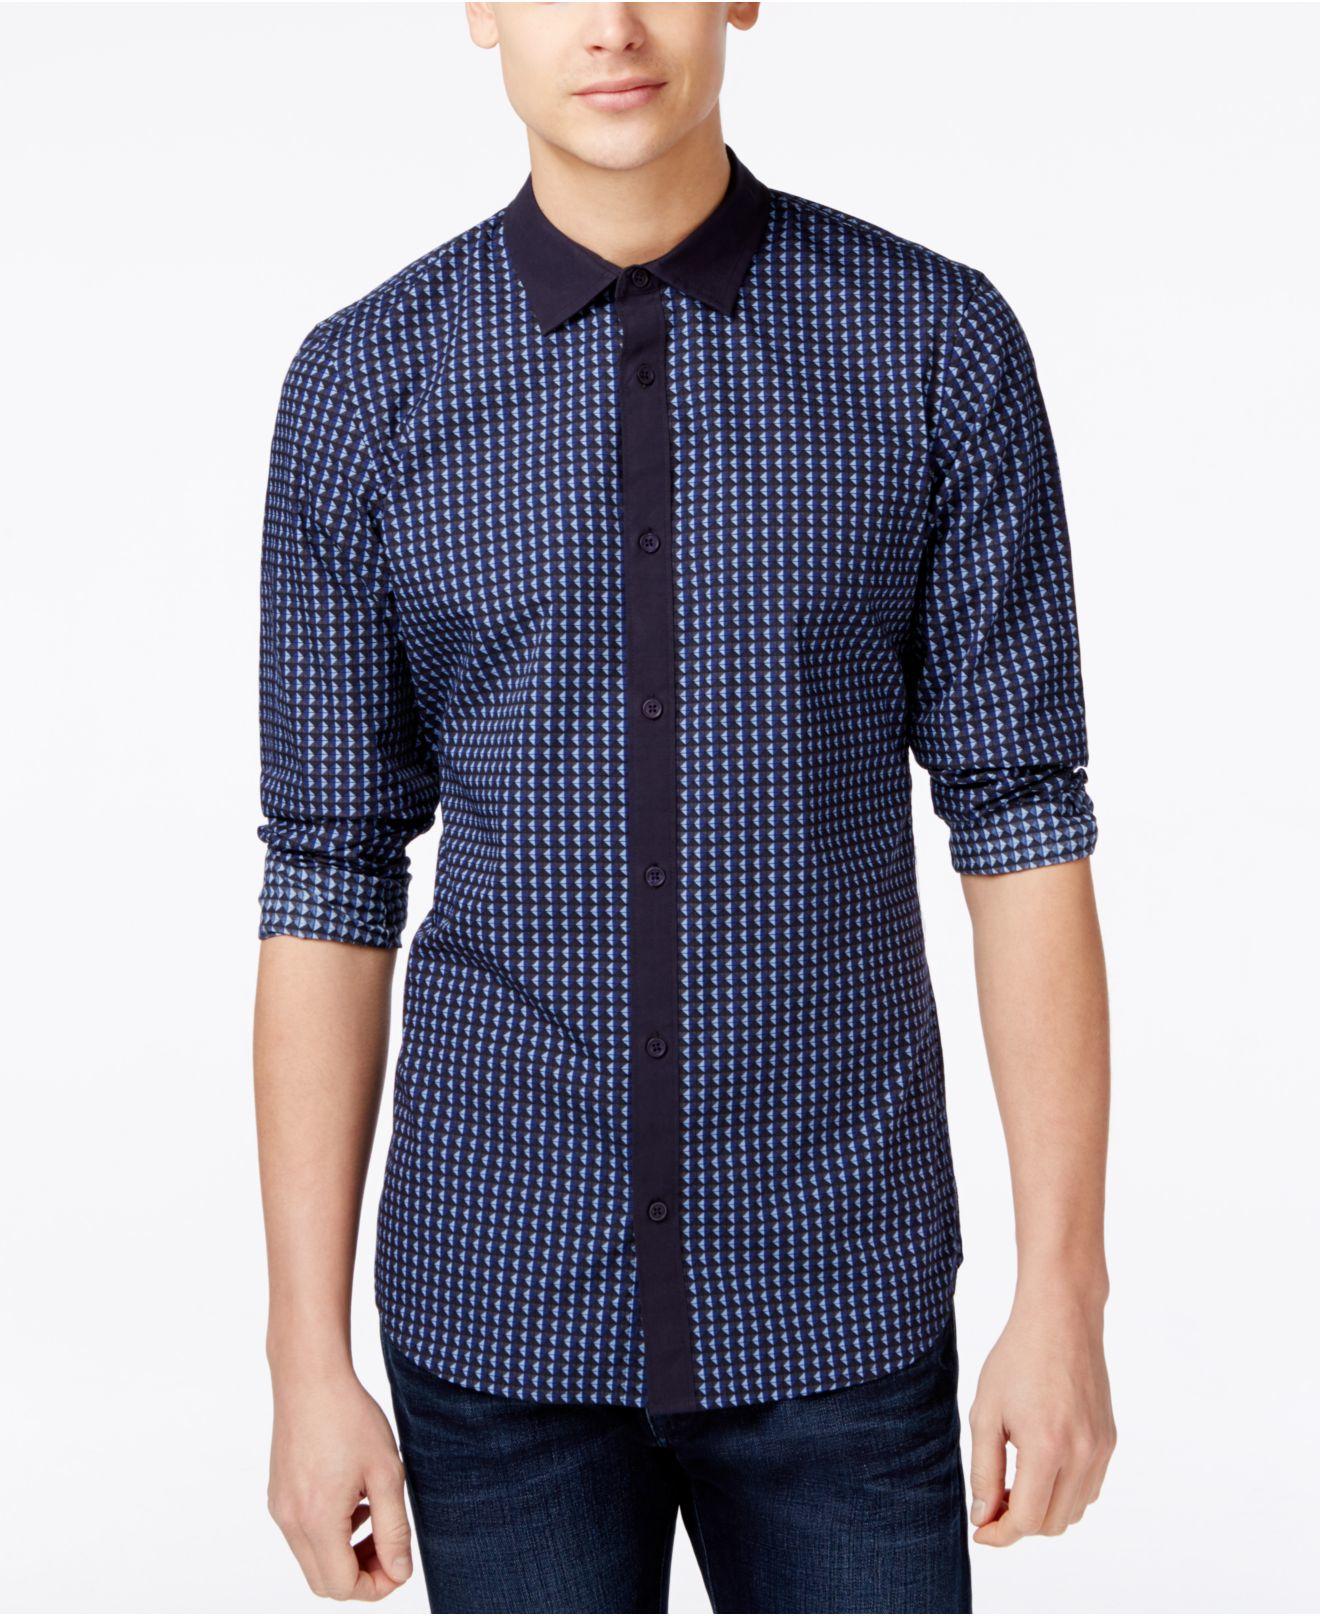 Brooks Brothers Mens Dress Shirts